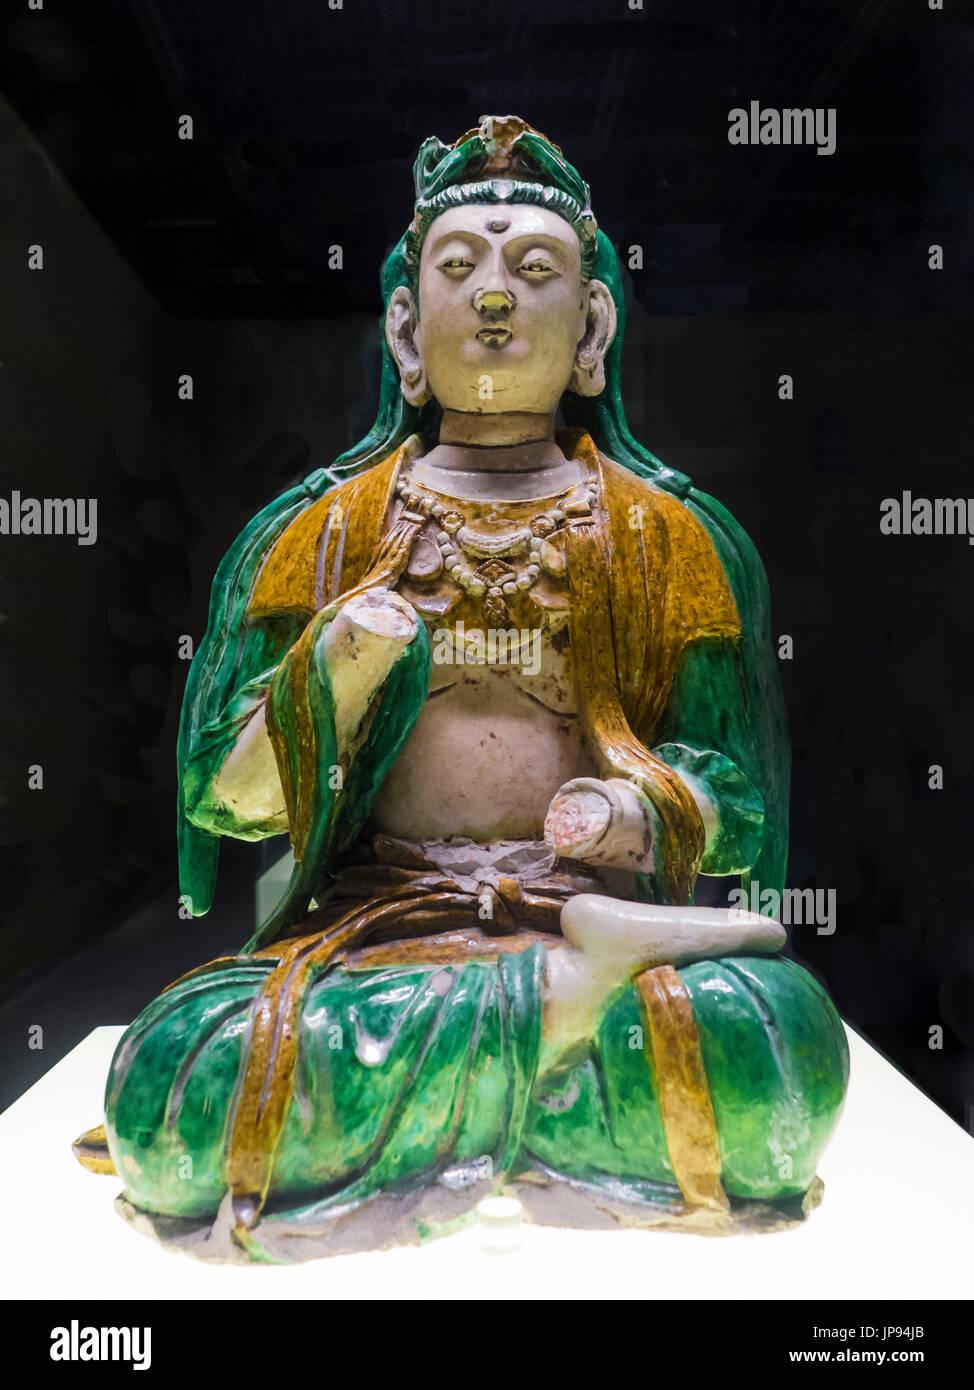 Bodhisattva tricolor (905 - 1125 DC) El Museo de la capital, Pekín, China Imagen De Stock